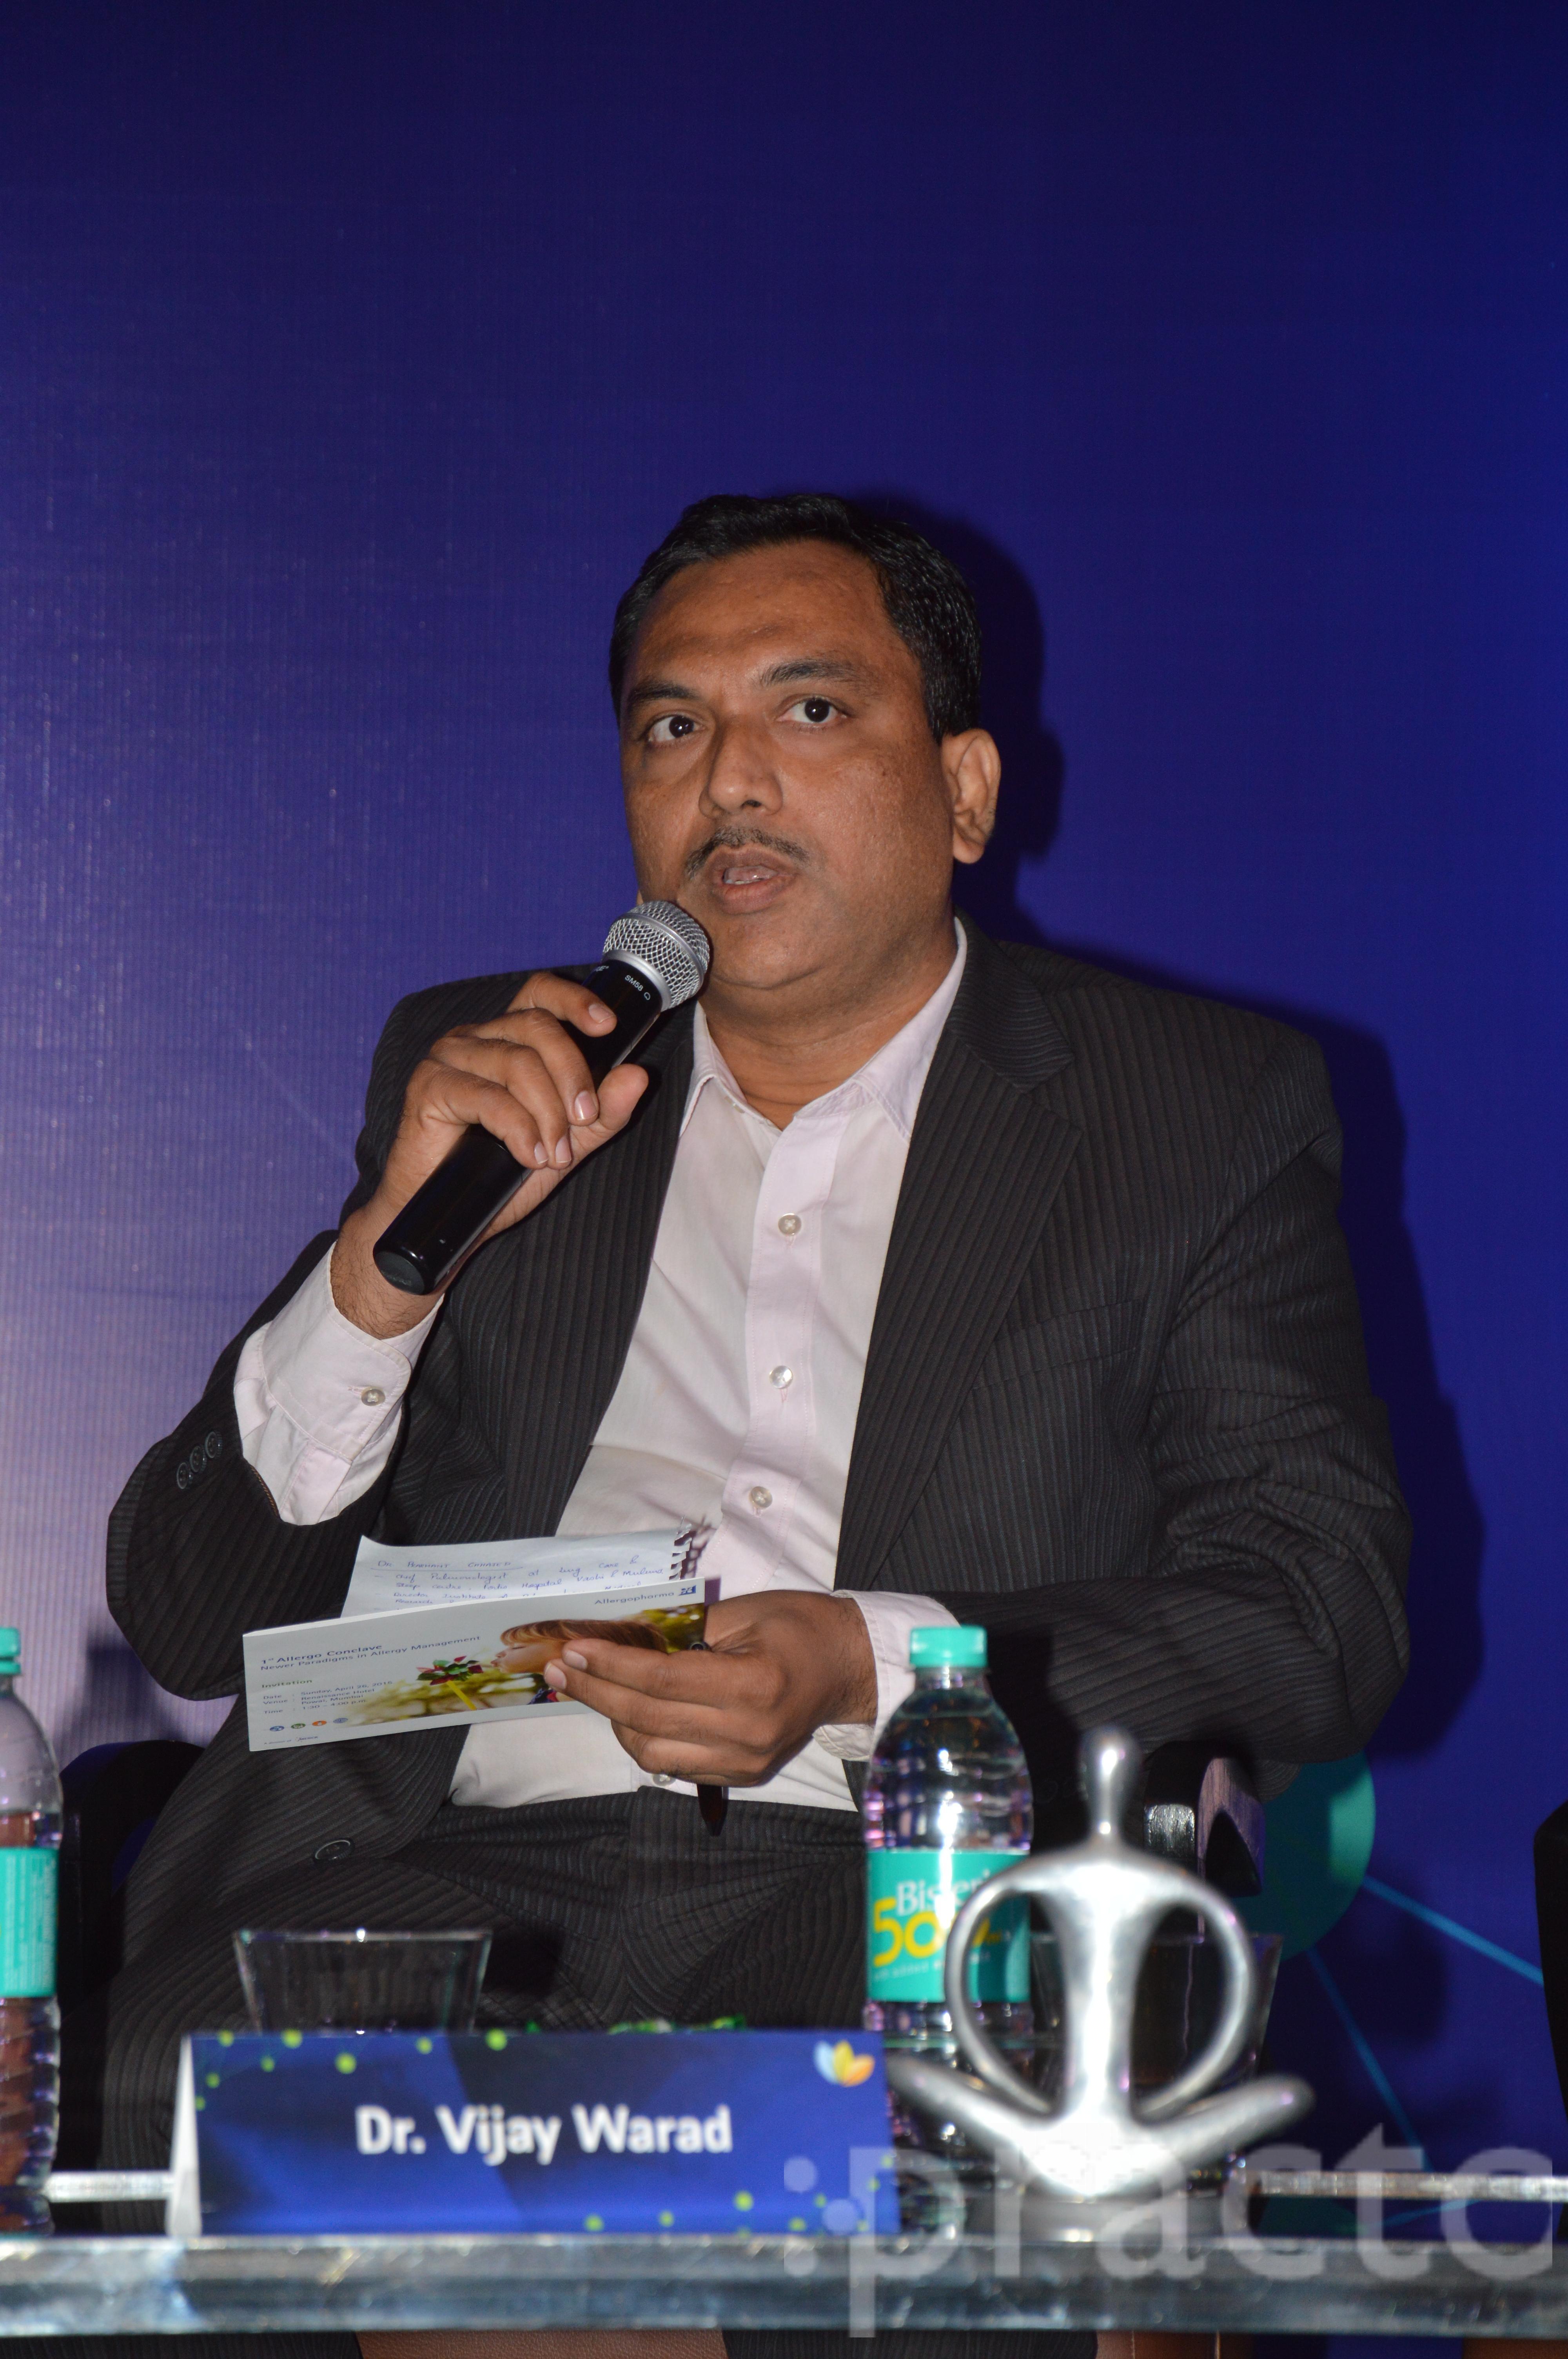 Dr. Vijay Warad - Dermatologist